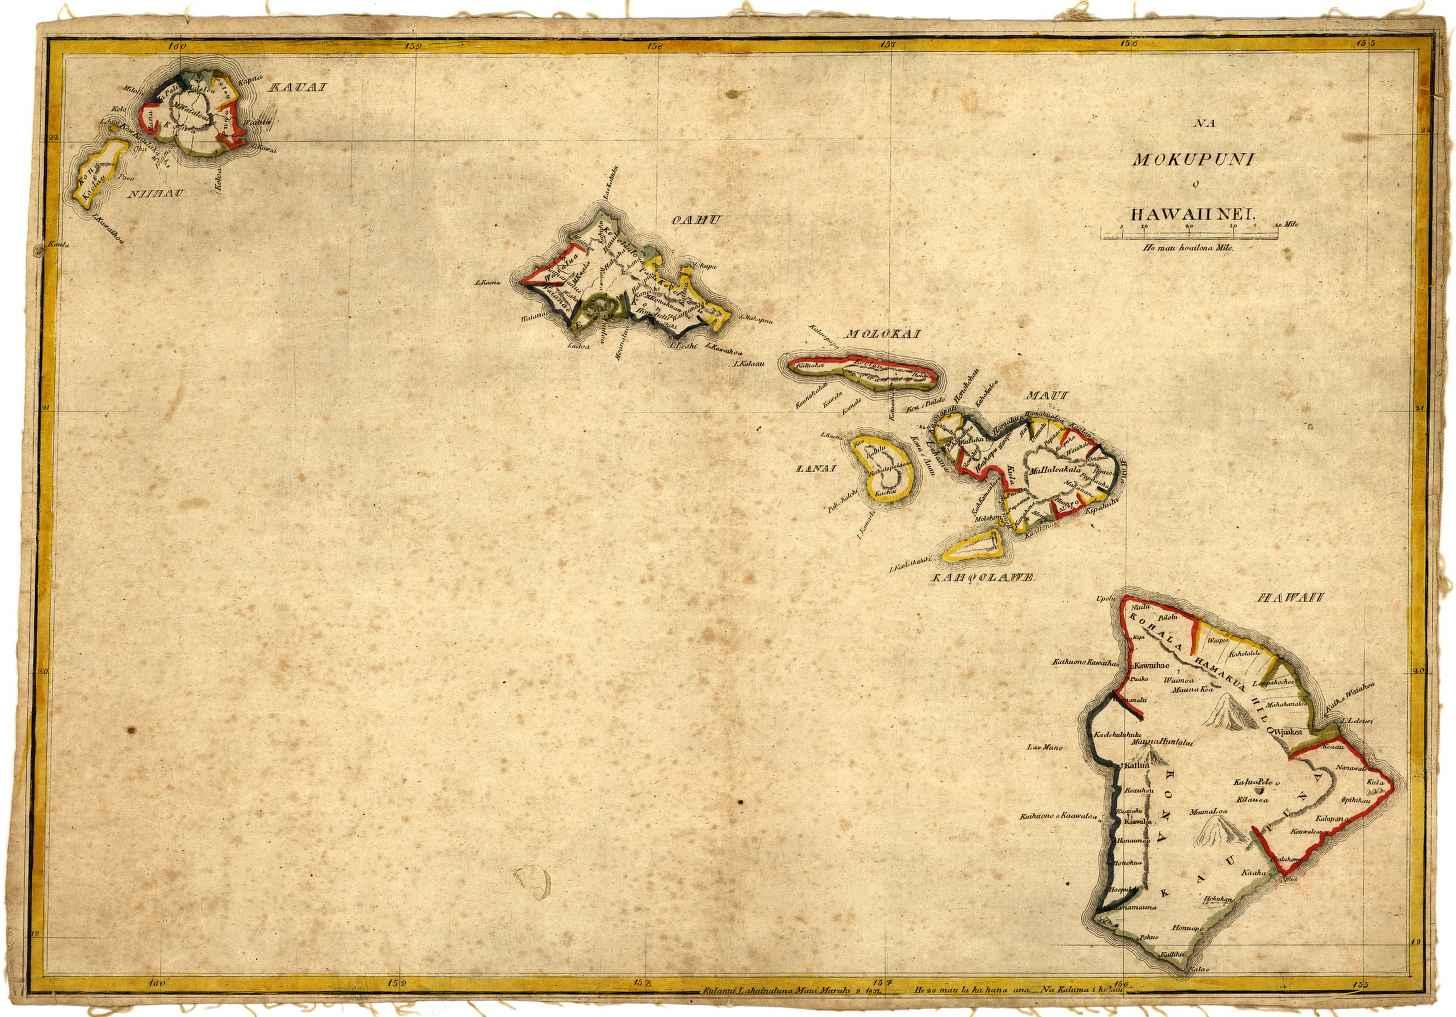 Hawaii Protectorate